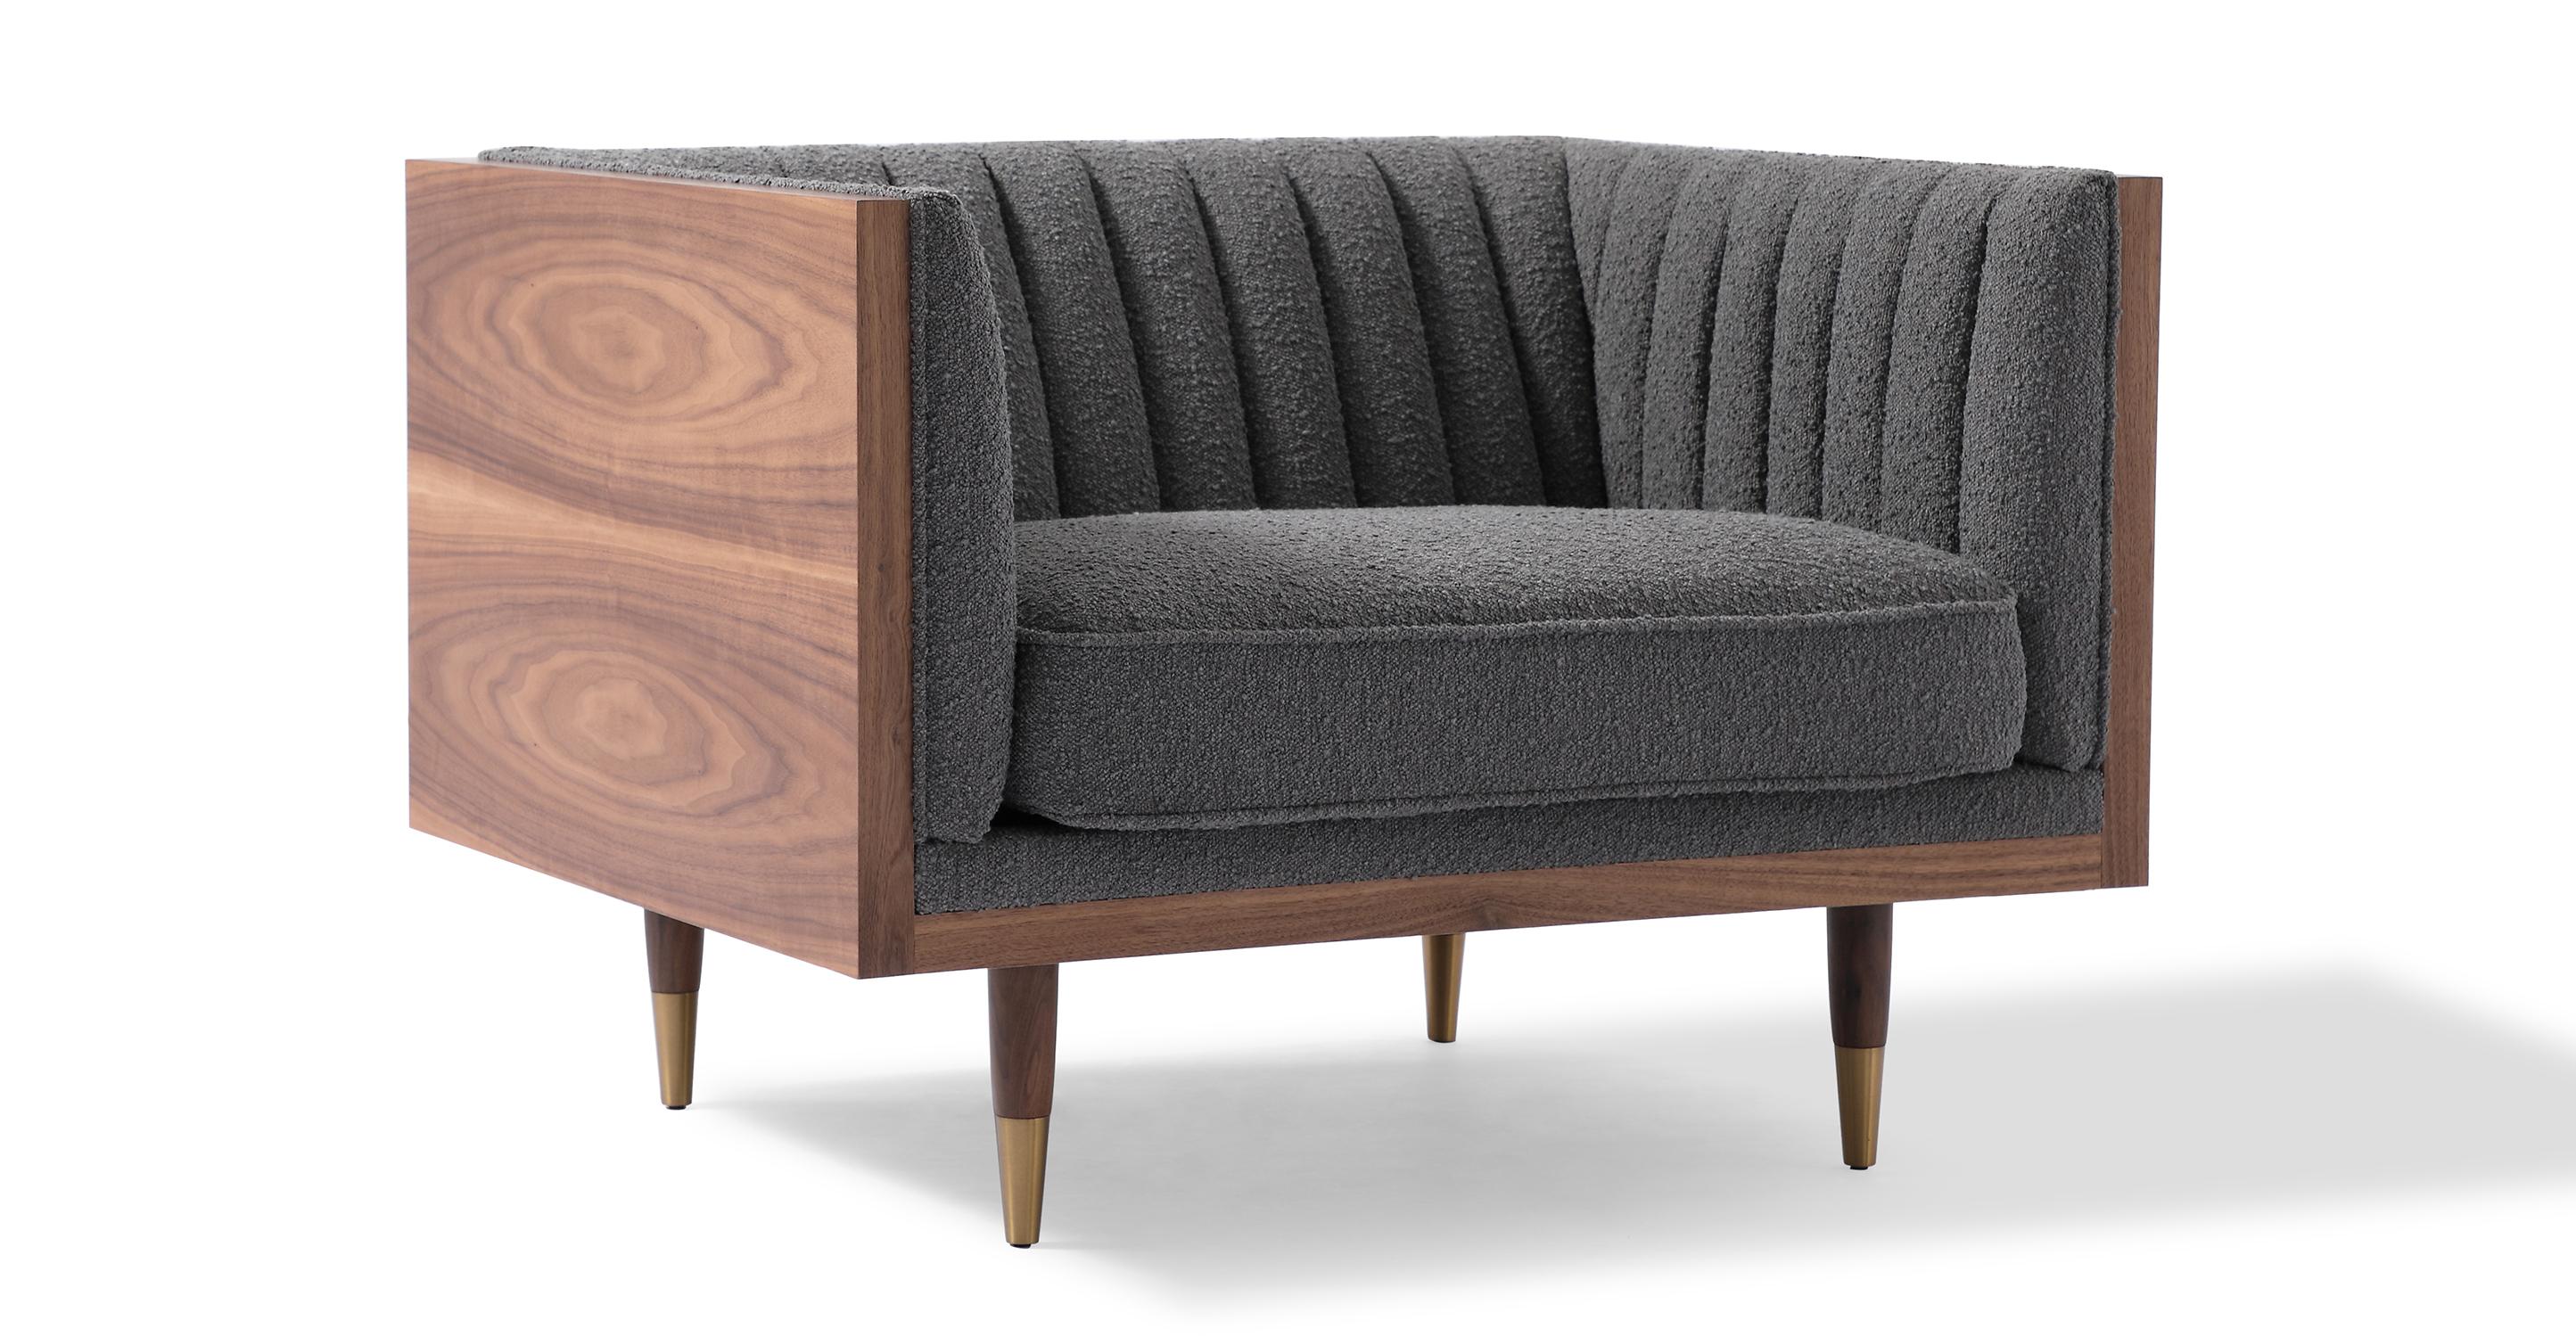 "Woodrow Linea 39"" Fabric Chair, Walnut/Gris Boucle"